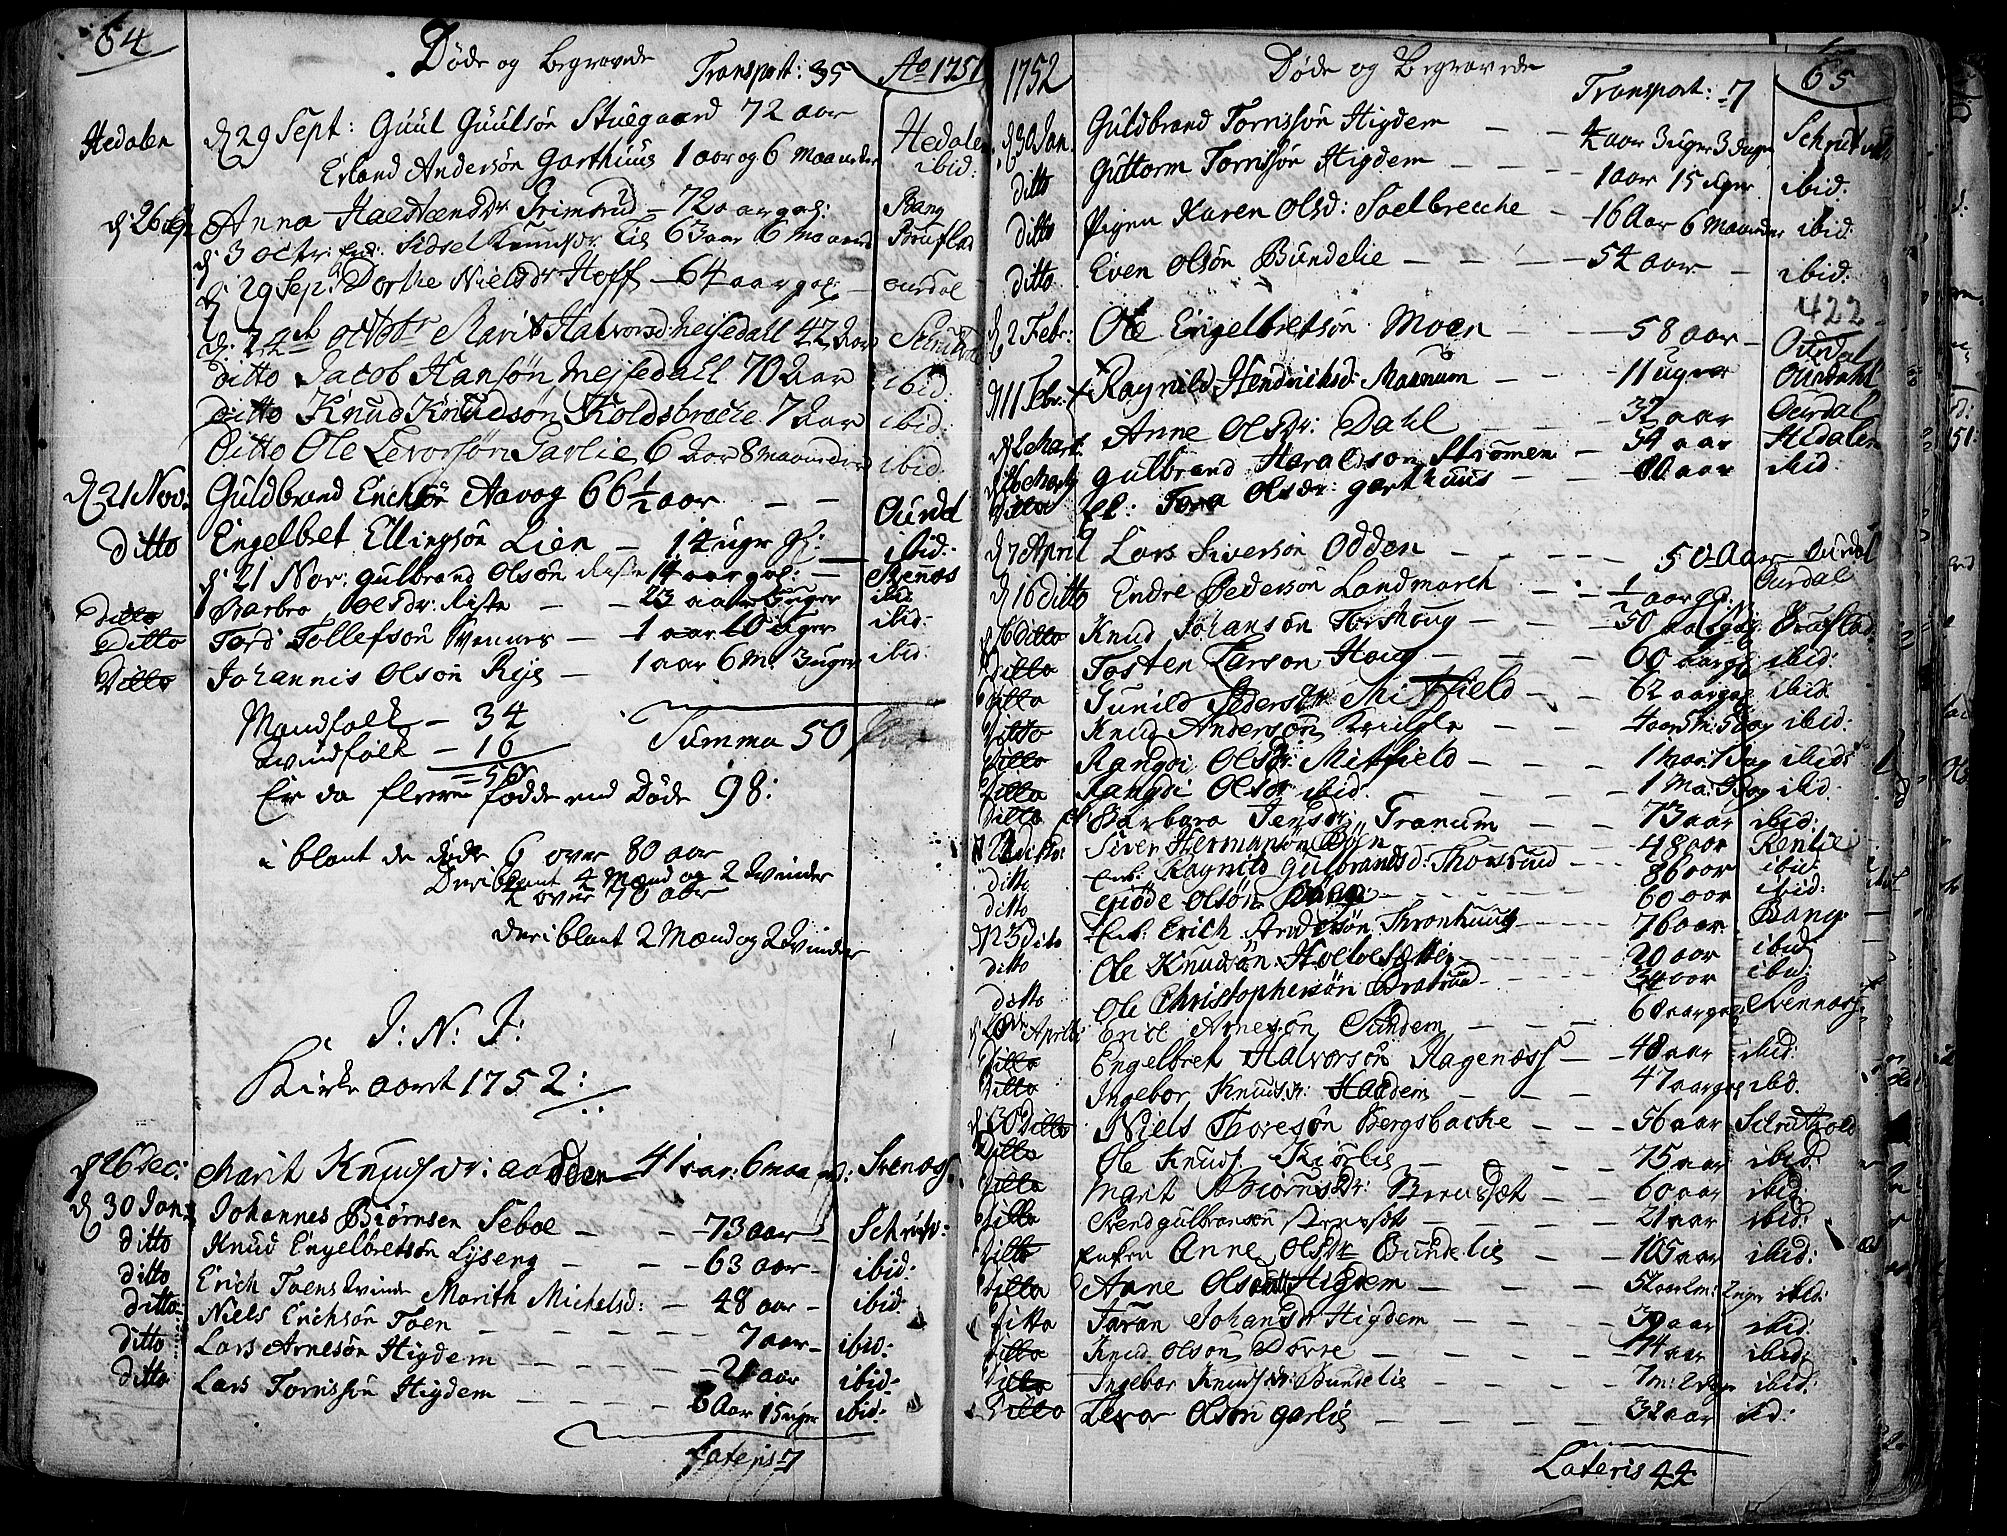 SAH, Aurdal prestekontor, Ministerialbok nr. 4, 1730-1762, s. 64-65